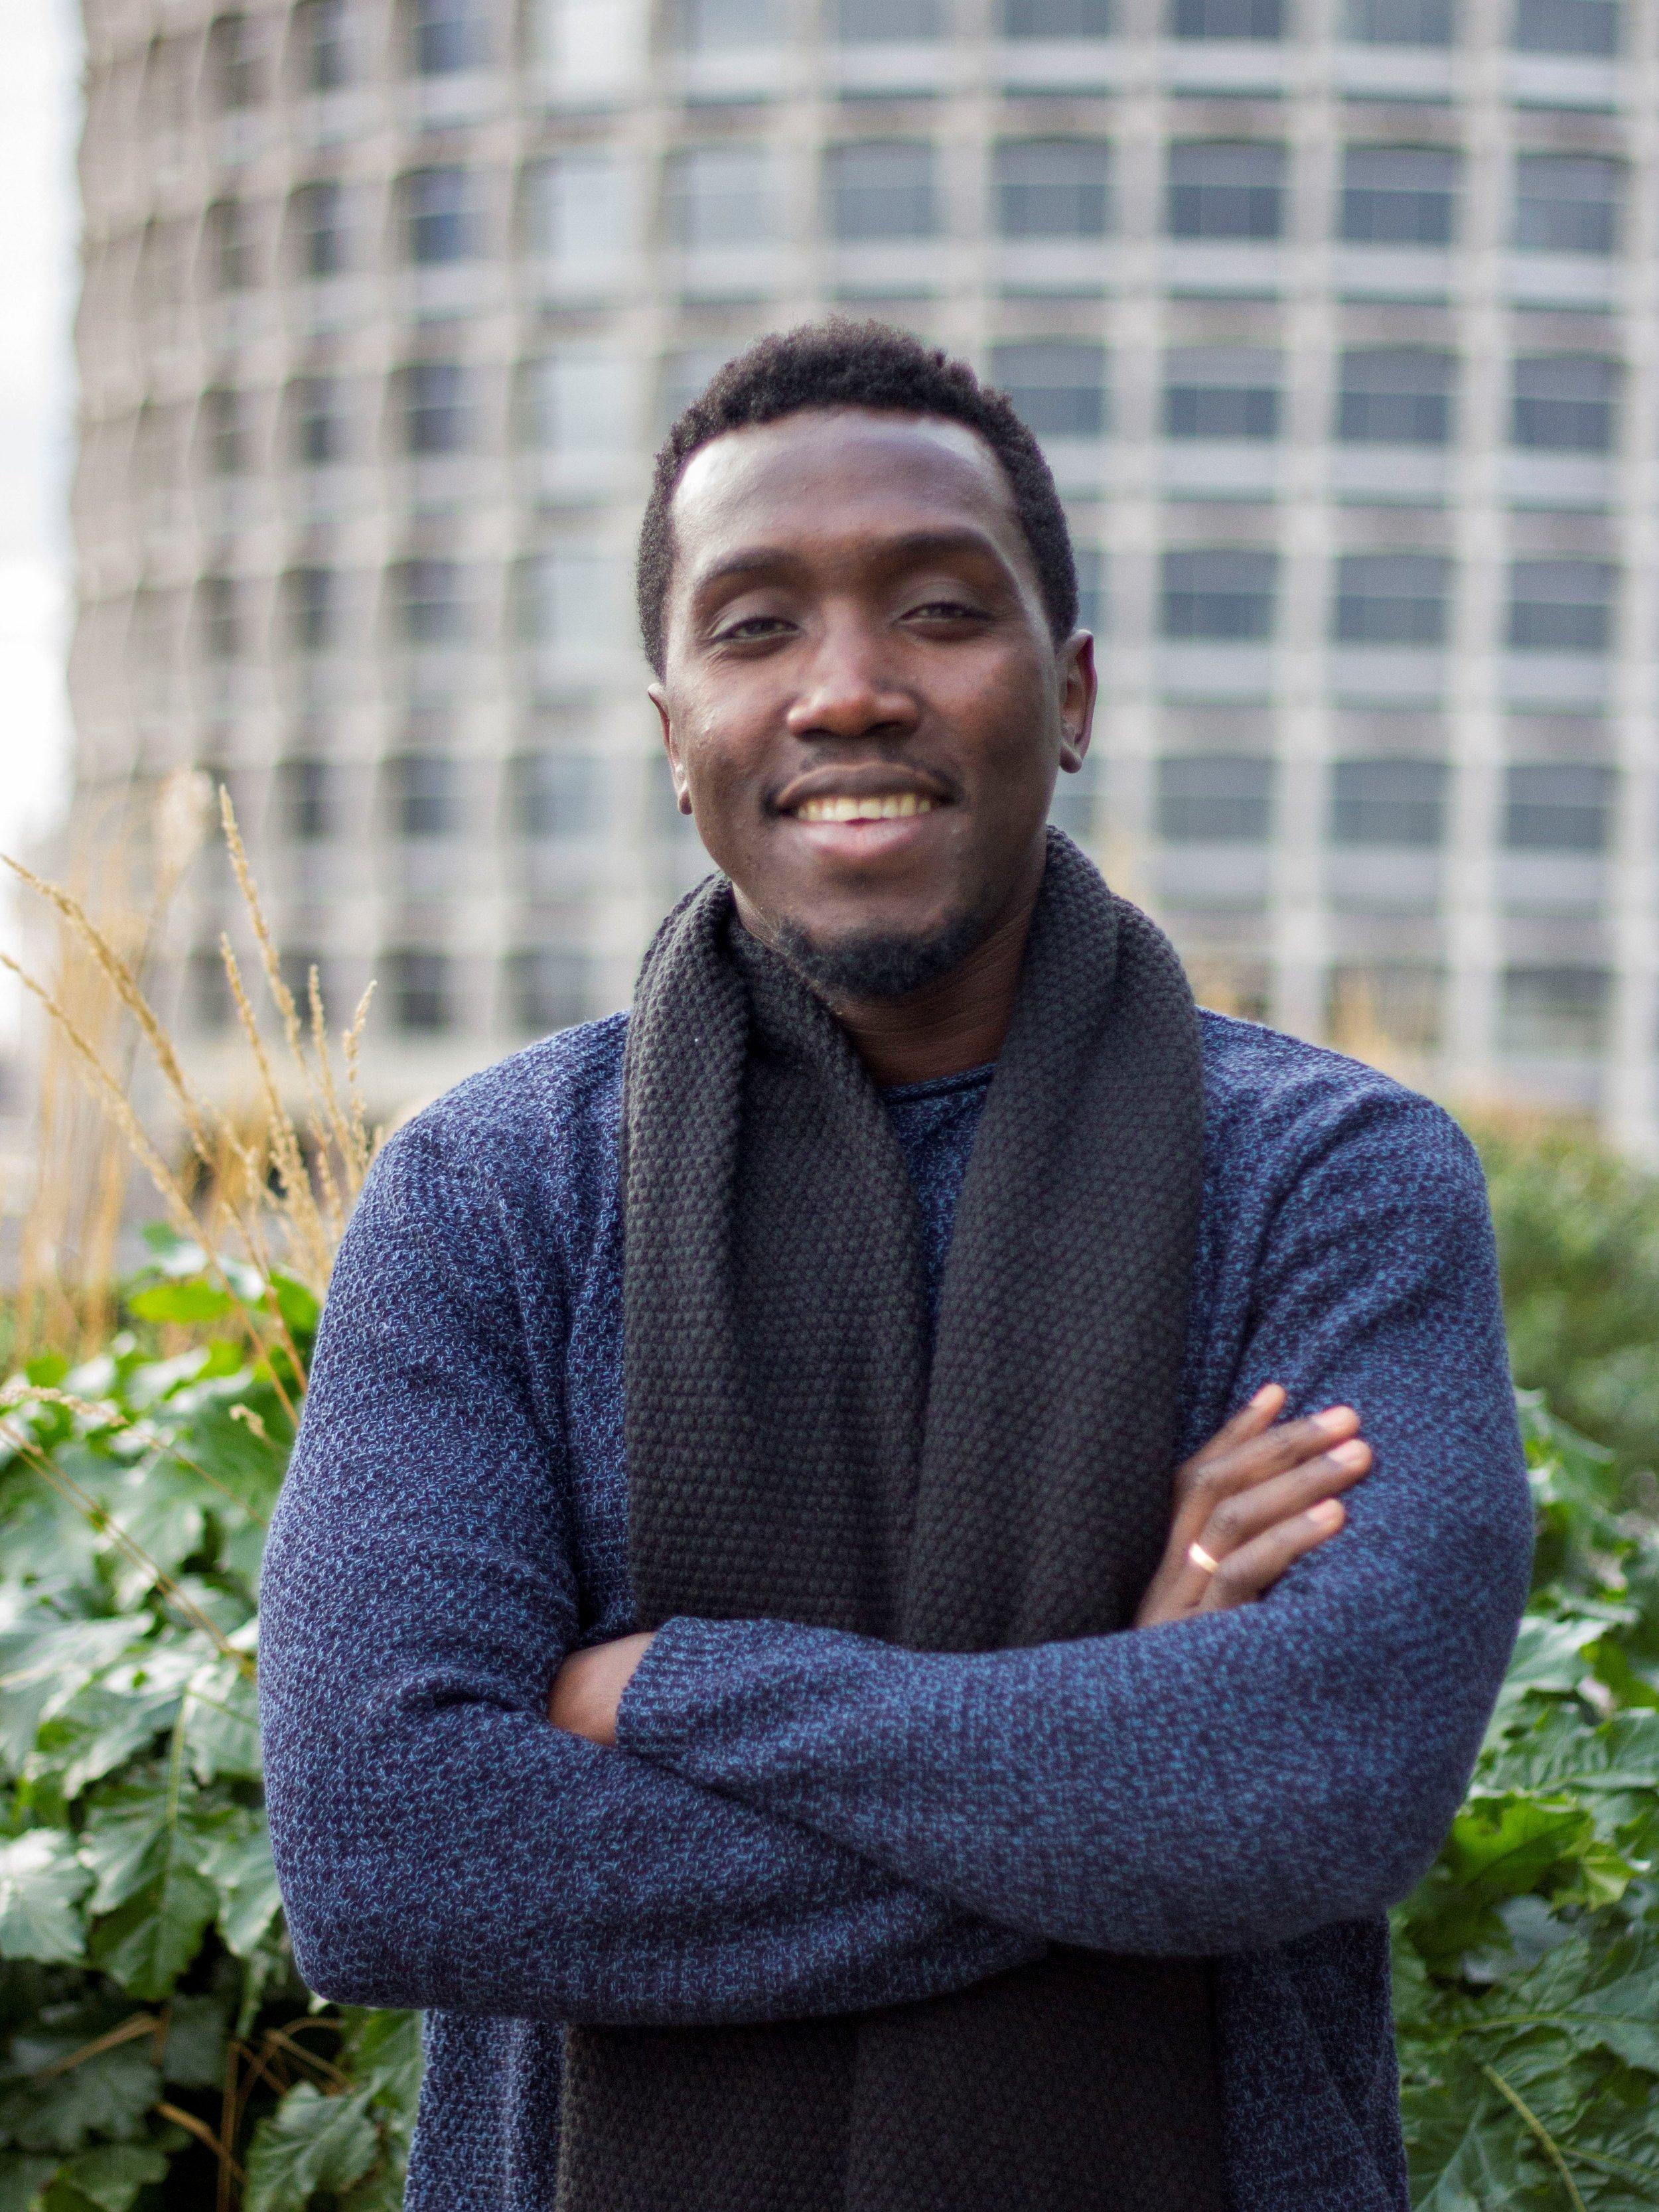 Louis Oyaro - Living in: Heidelberg, GermanyNationality: Ugandan